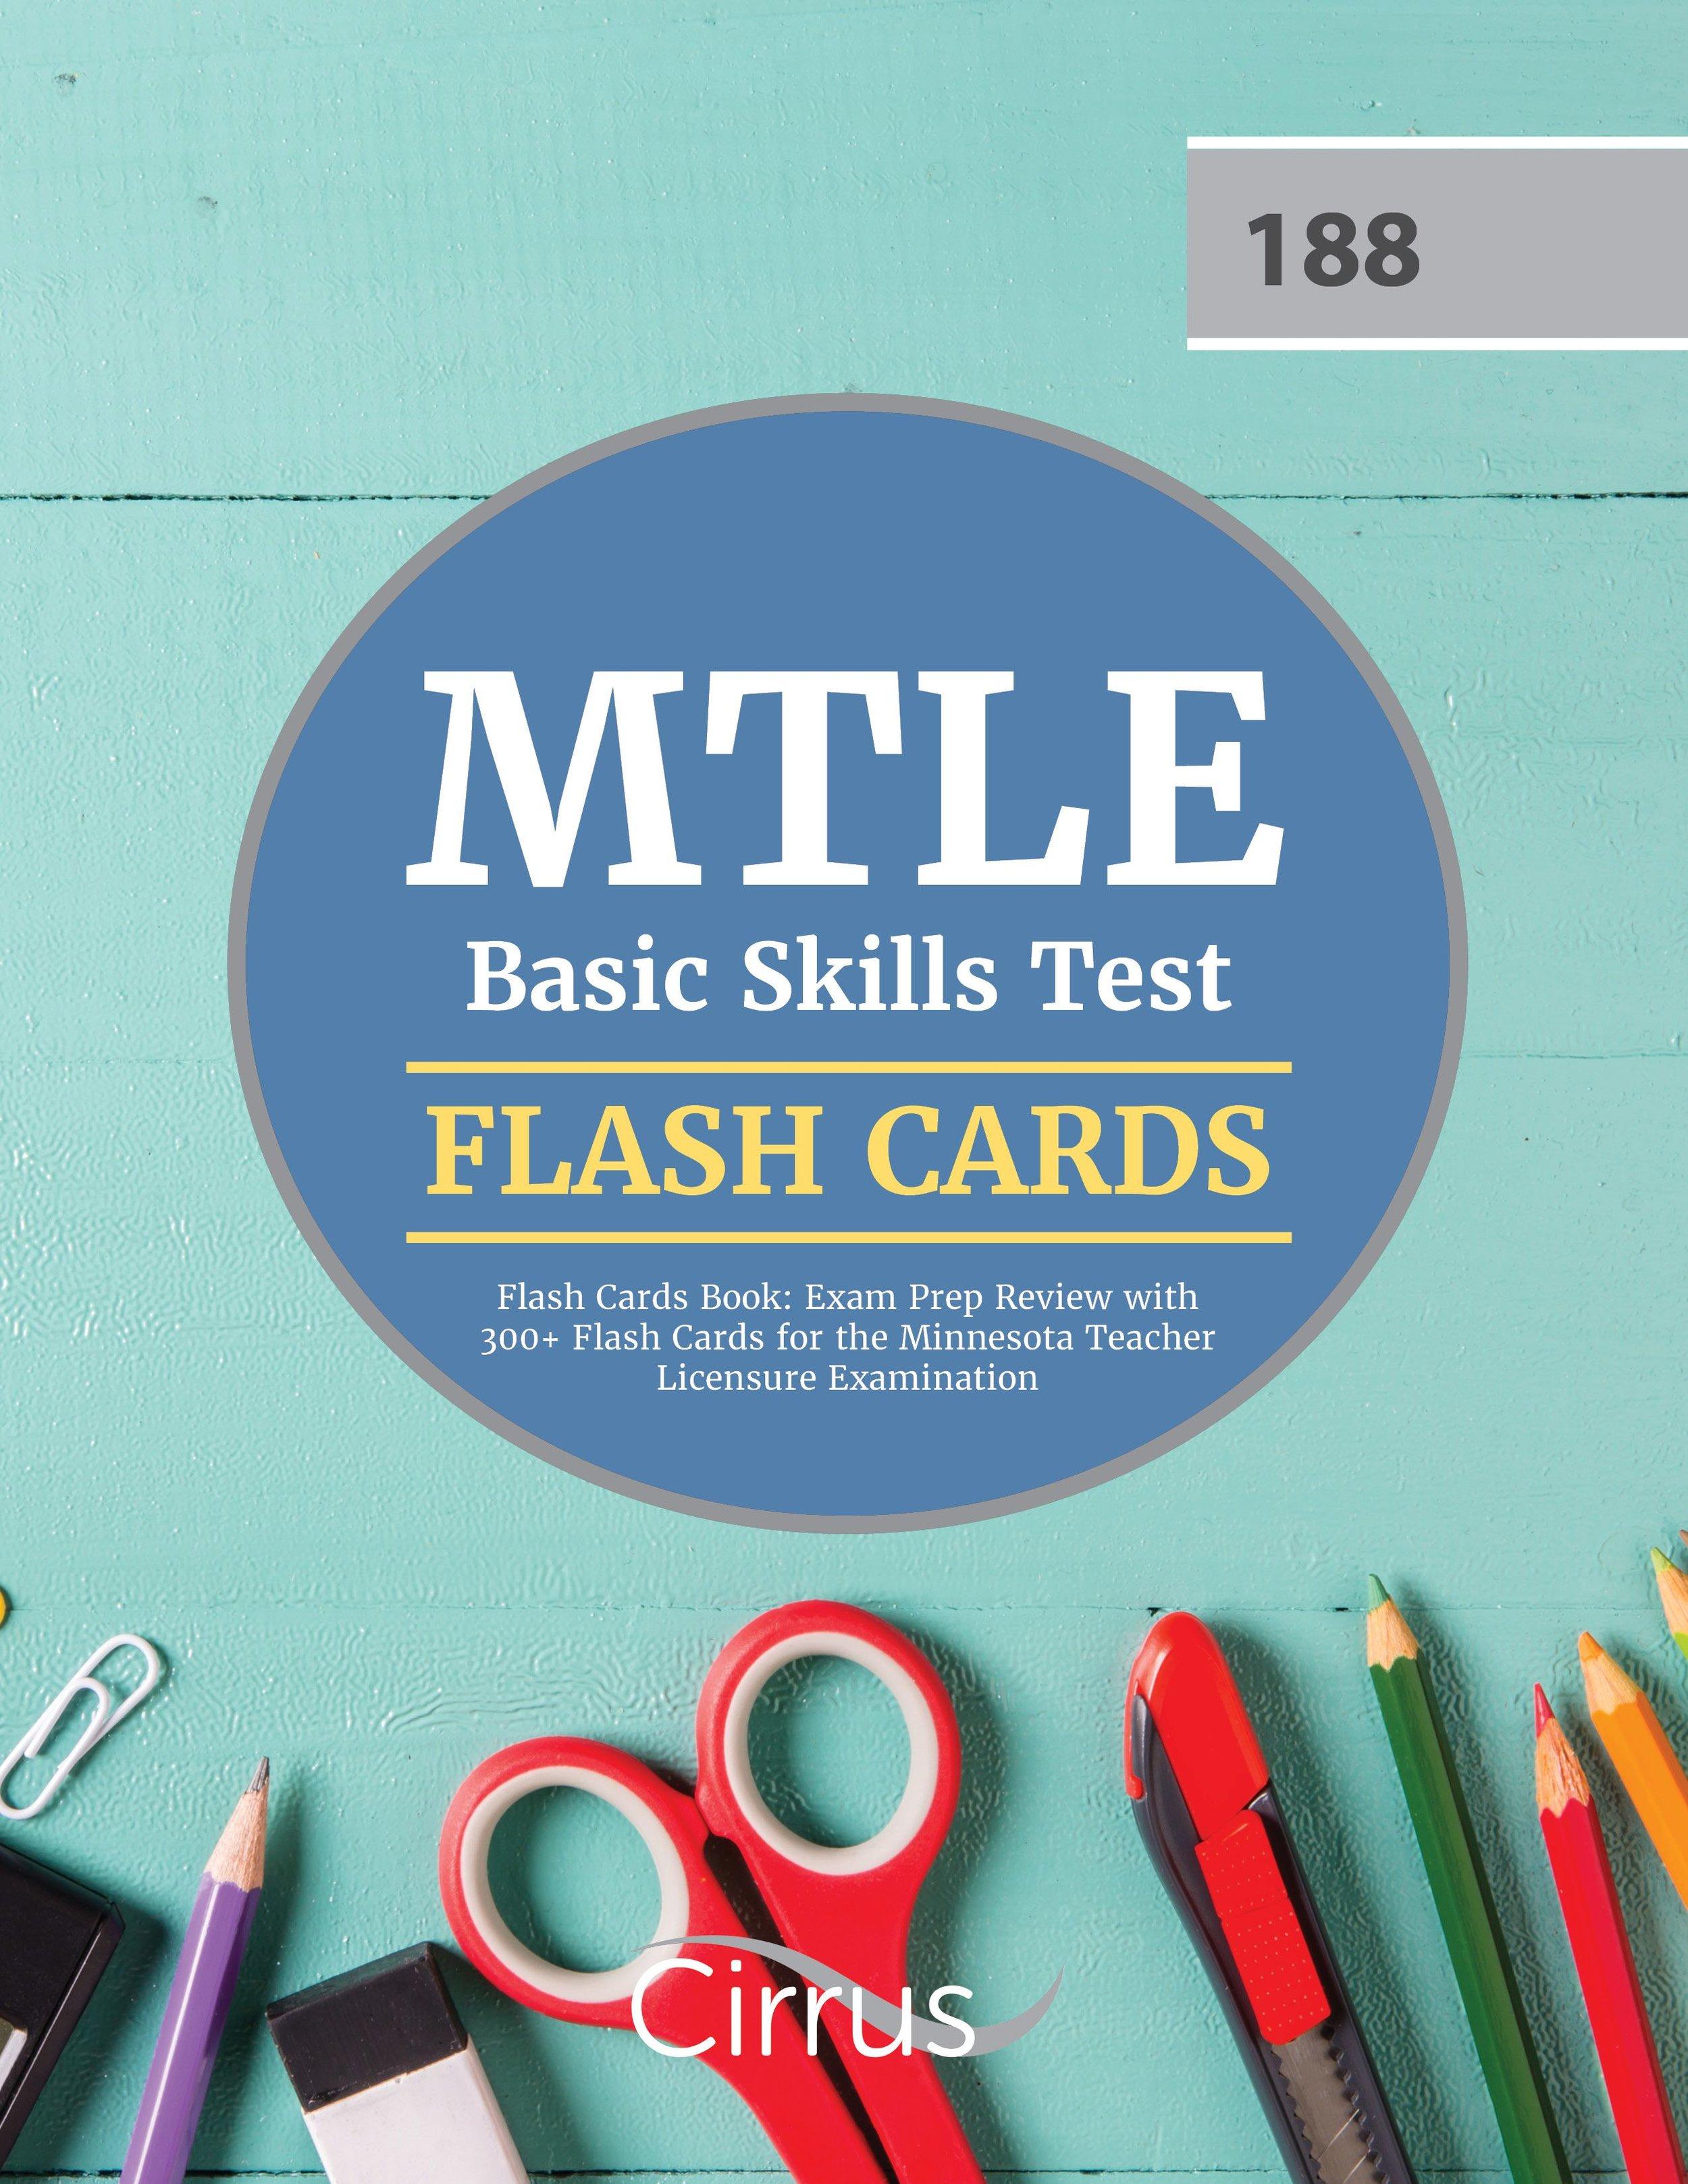 MTLE Basic Skills (188) Flash Cards Book